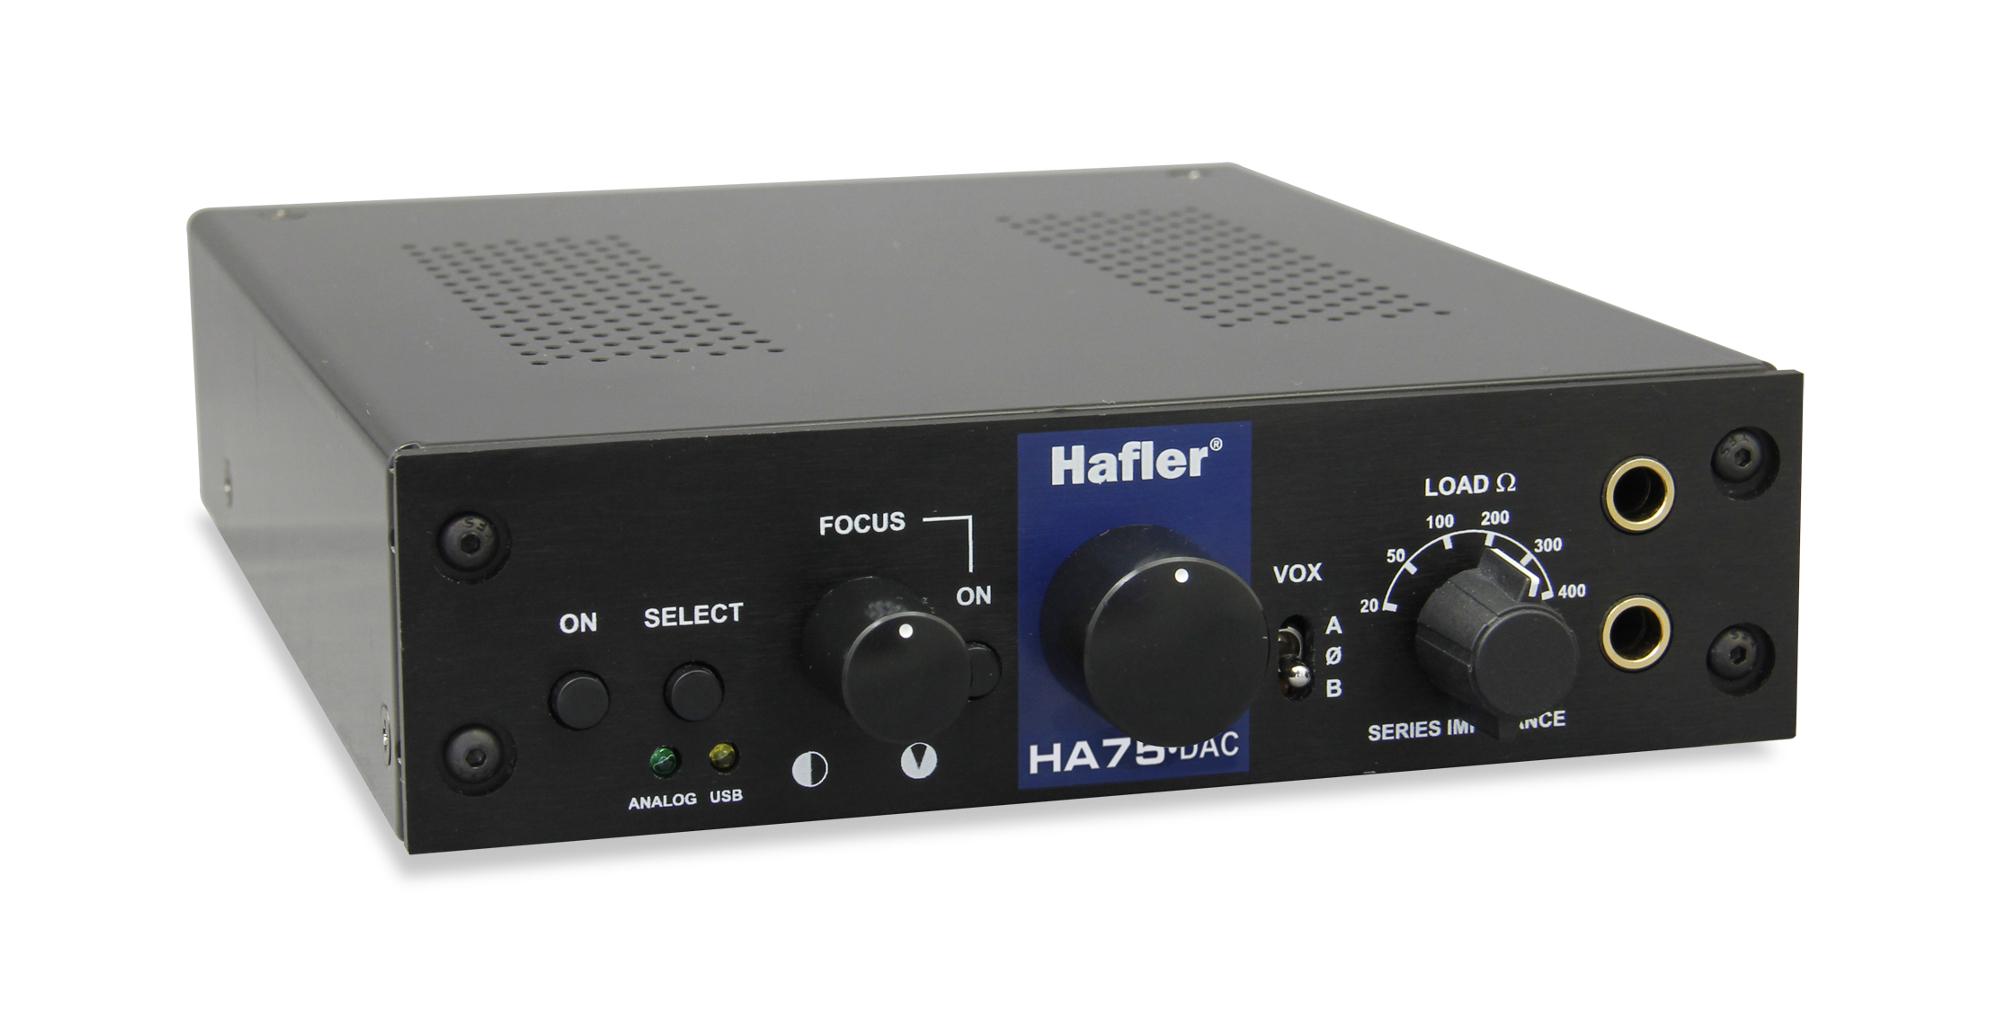 Combo Usb Dac And Tube Head Headphone Amp By Hafler Ha75 Full Audio Enhancement For Analog Amplifier